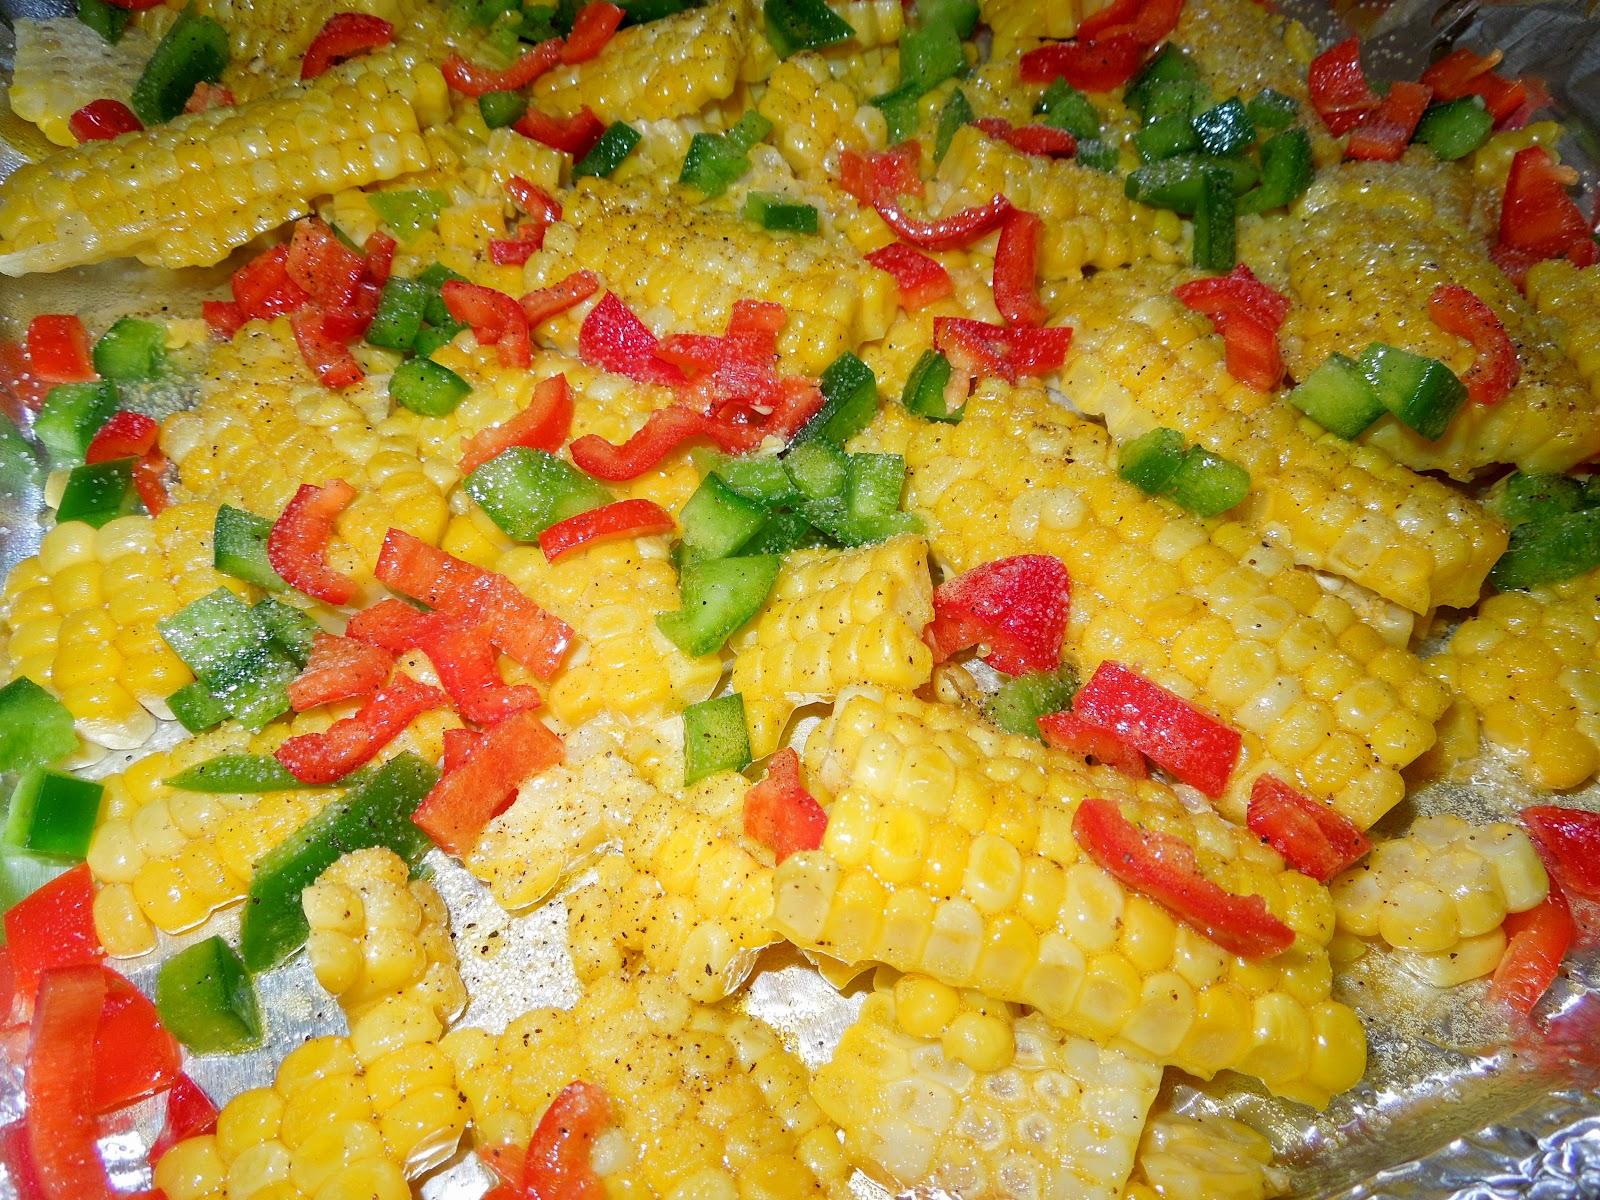 Melissa's Southern Style Kitchen: Confetti Corn & Black Bean Medley